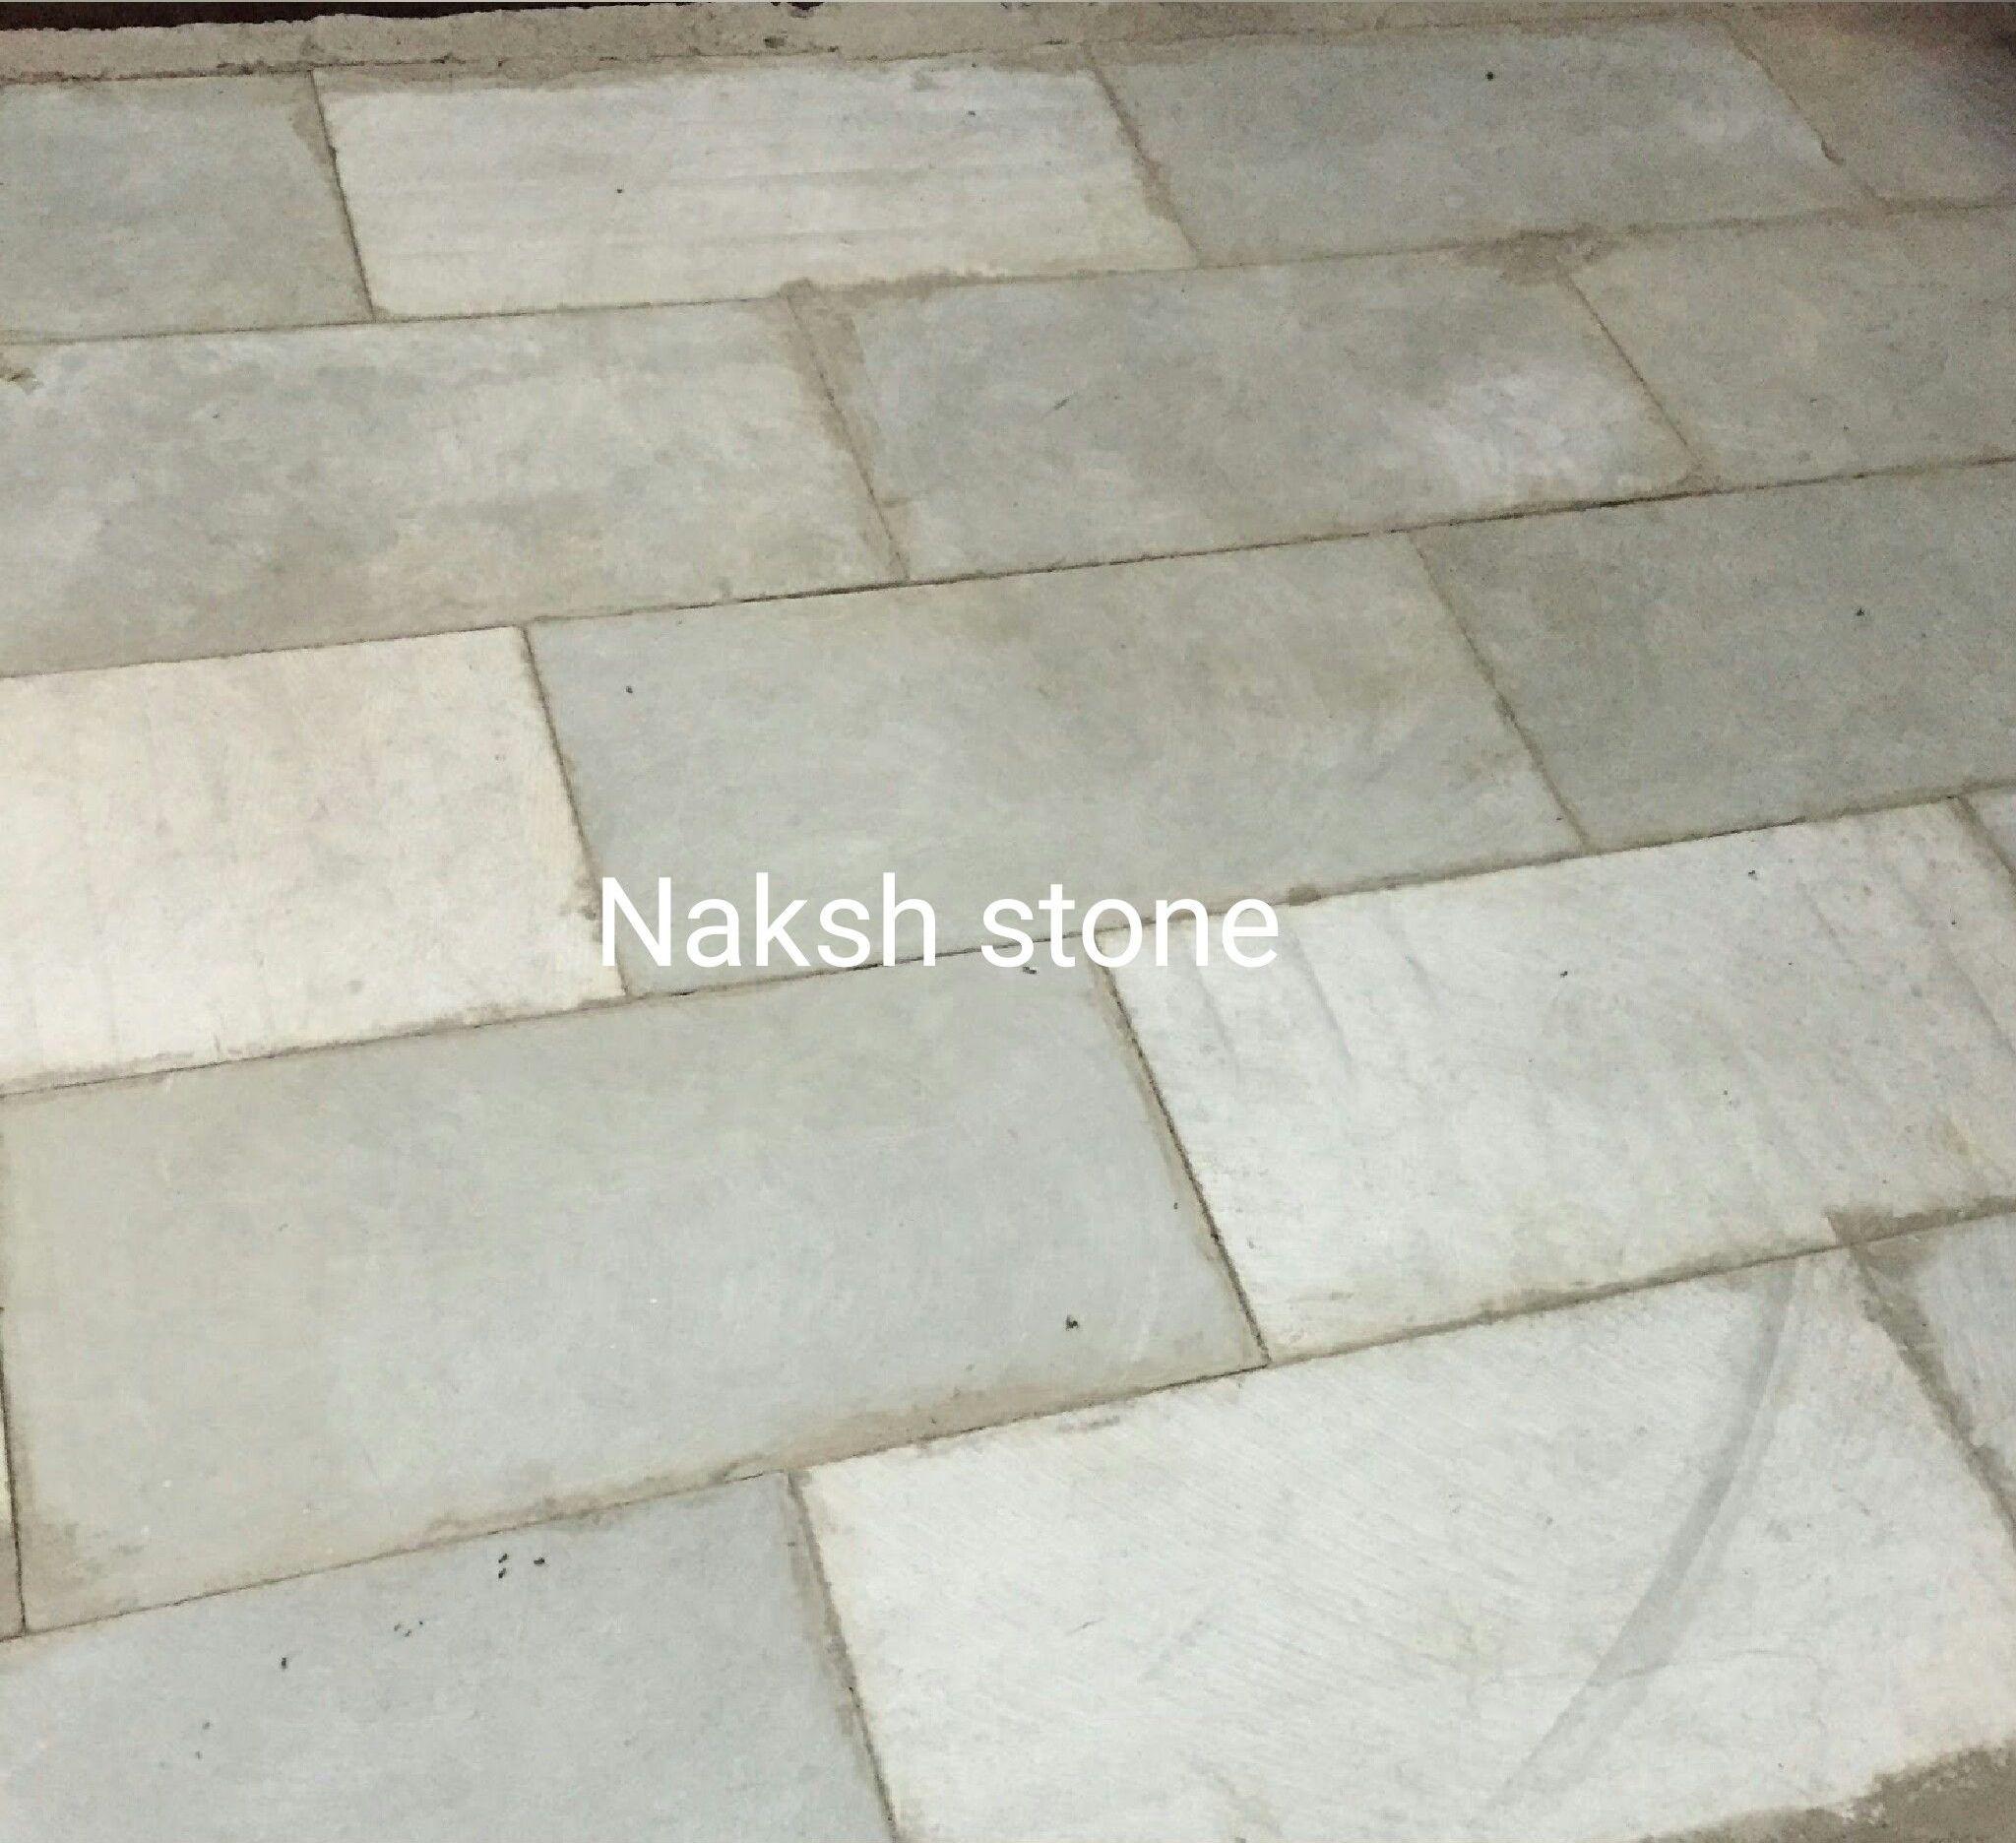 Kota Stone Flooring Advantages and Disadvantages